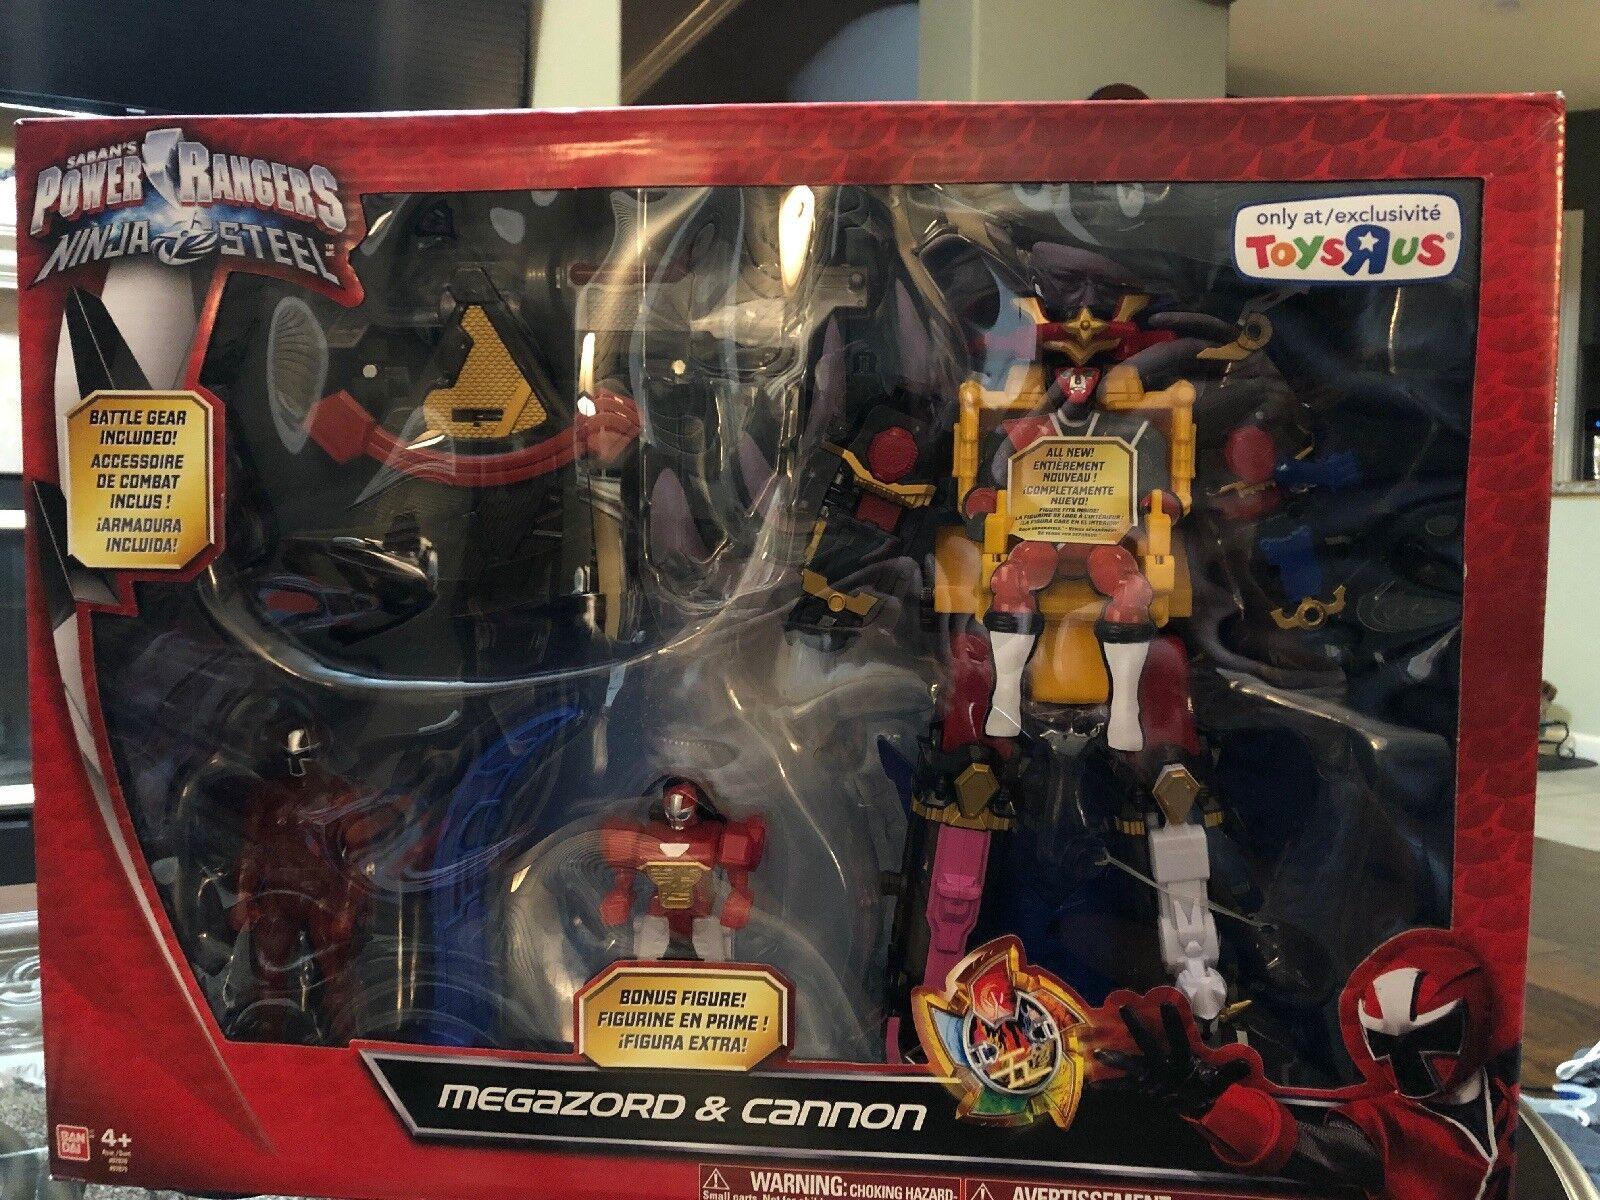 Power rangers ninja - megazord & cannon dx - schlacht morpher tru toys r us